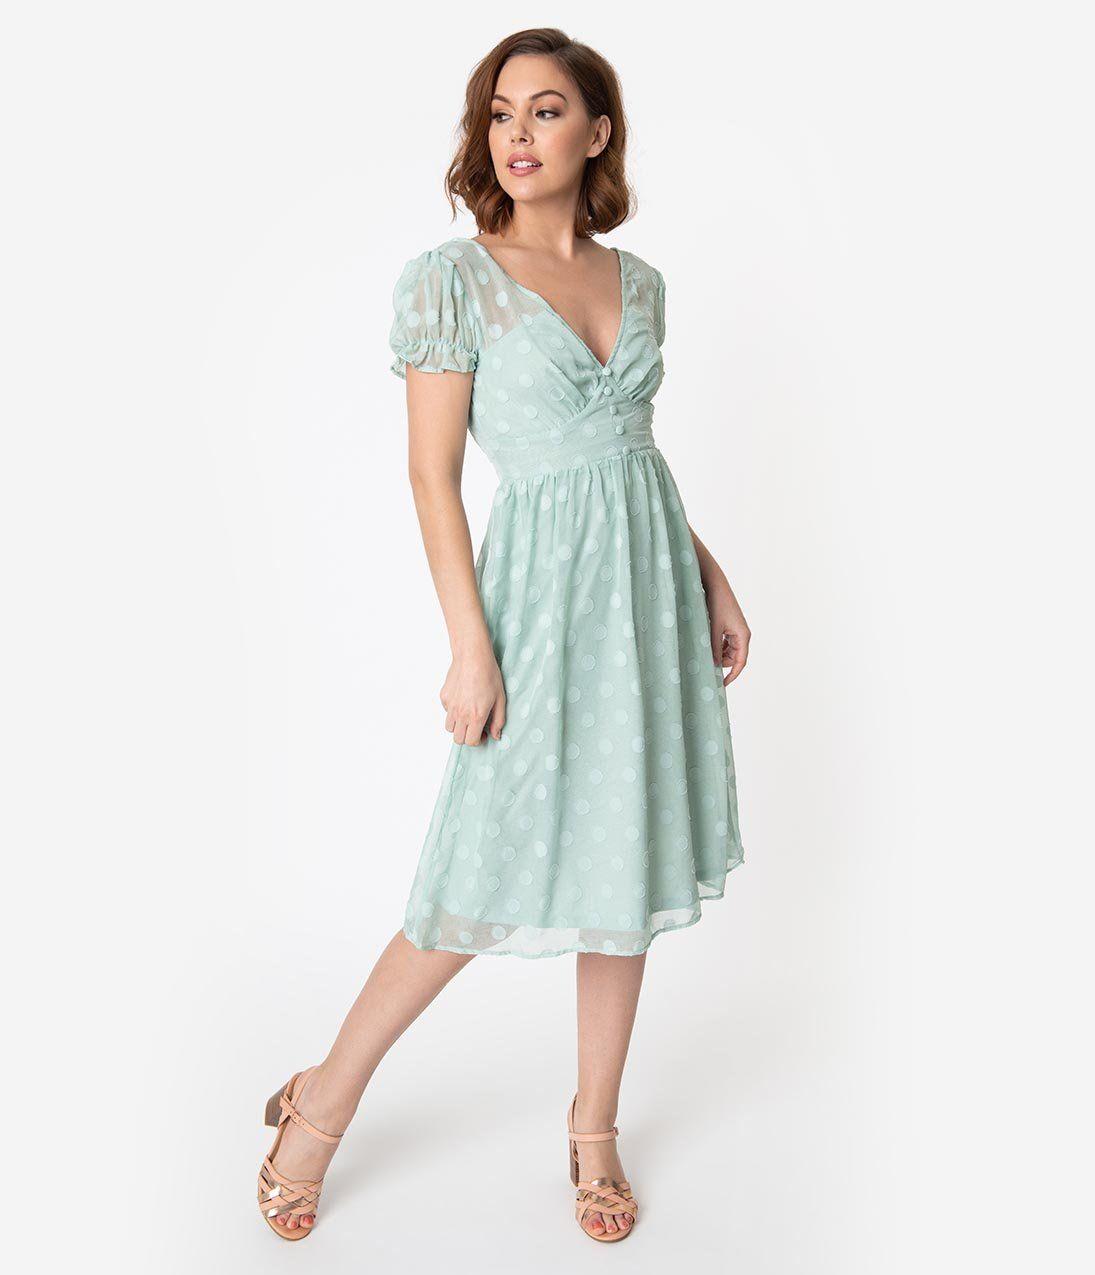 Vintage Cocktail Dresses Party Dresses Prom Dresses Modest Dresses Fit Flare Dress Modest Dresses Casual [ 1275 x 1095 Pixel ]